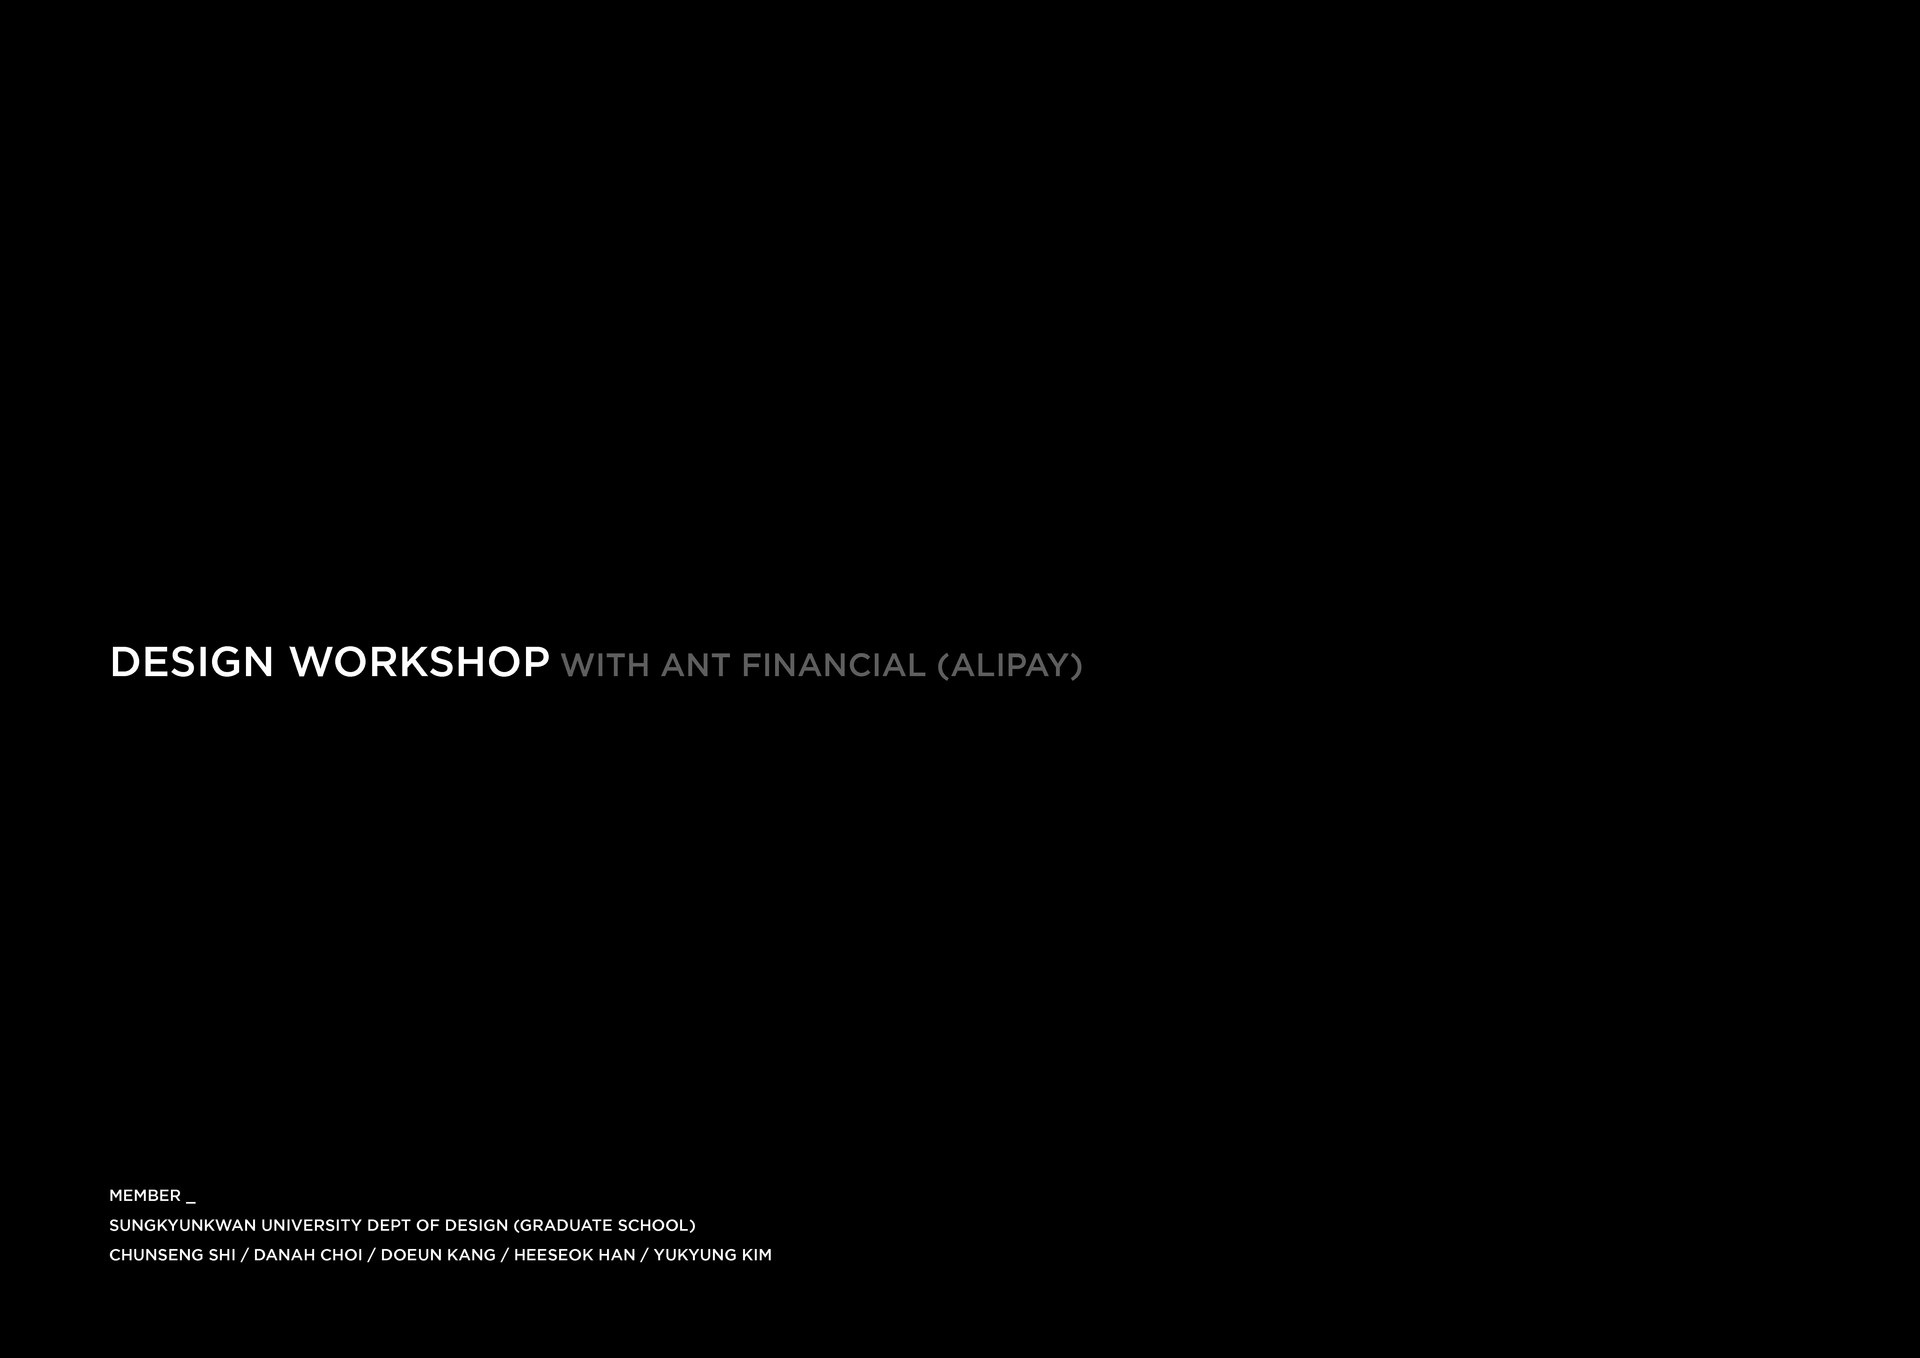 alipay_workshop_中文_페이지_01.jpg